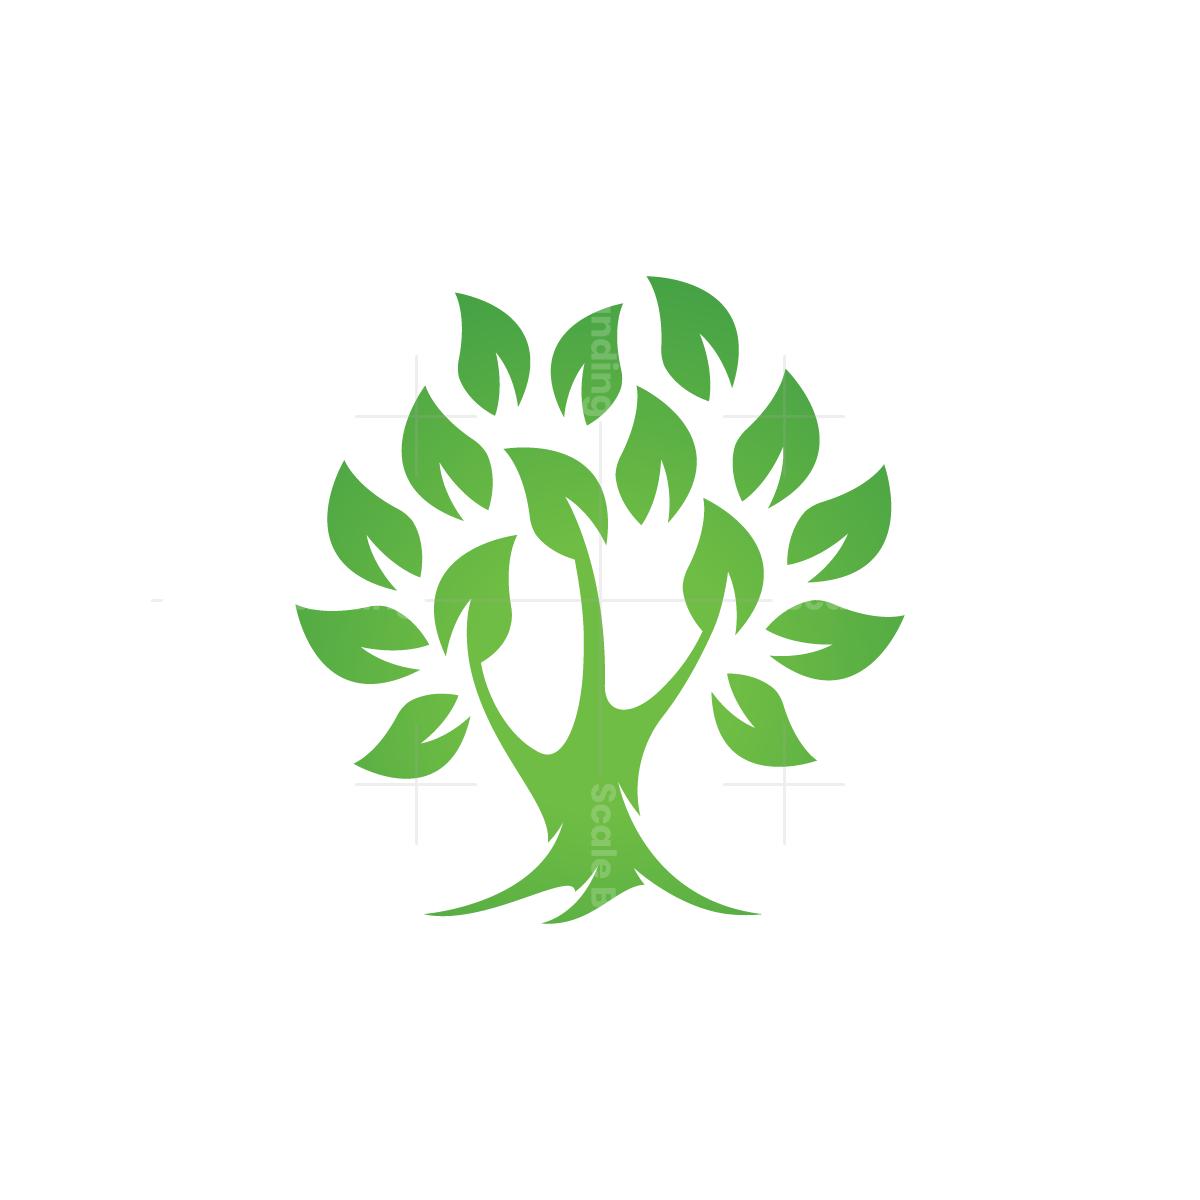 Green Leaves Tree Logo